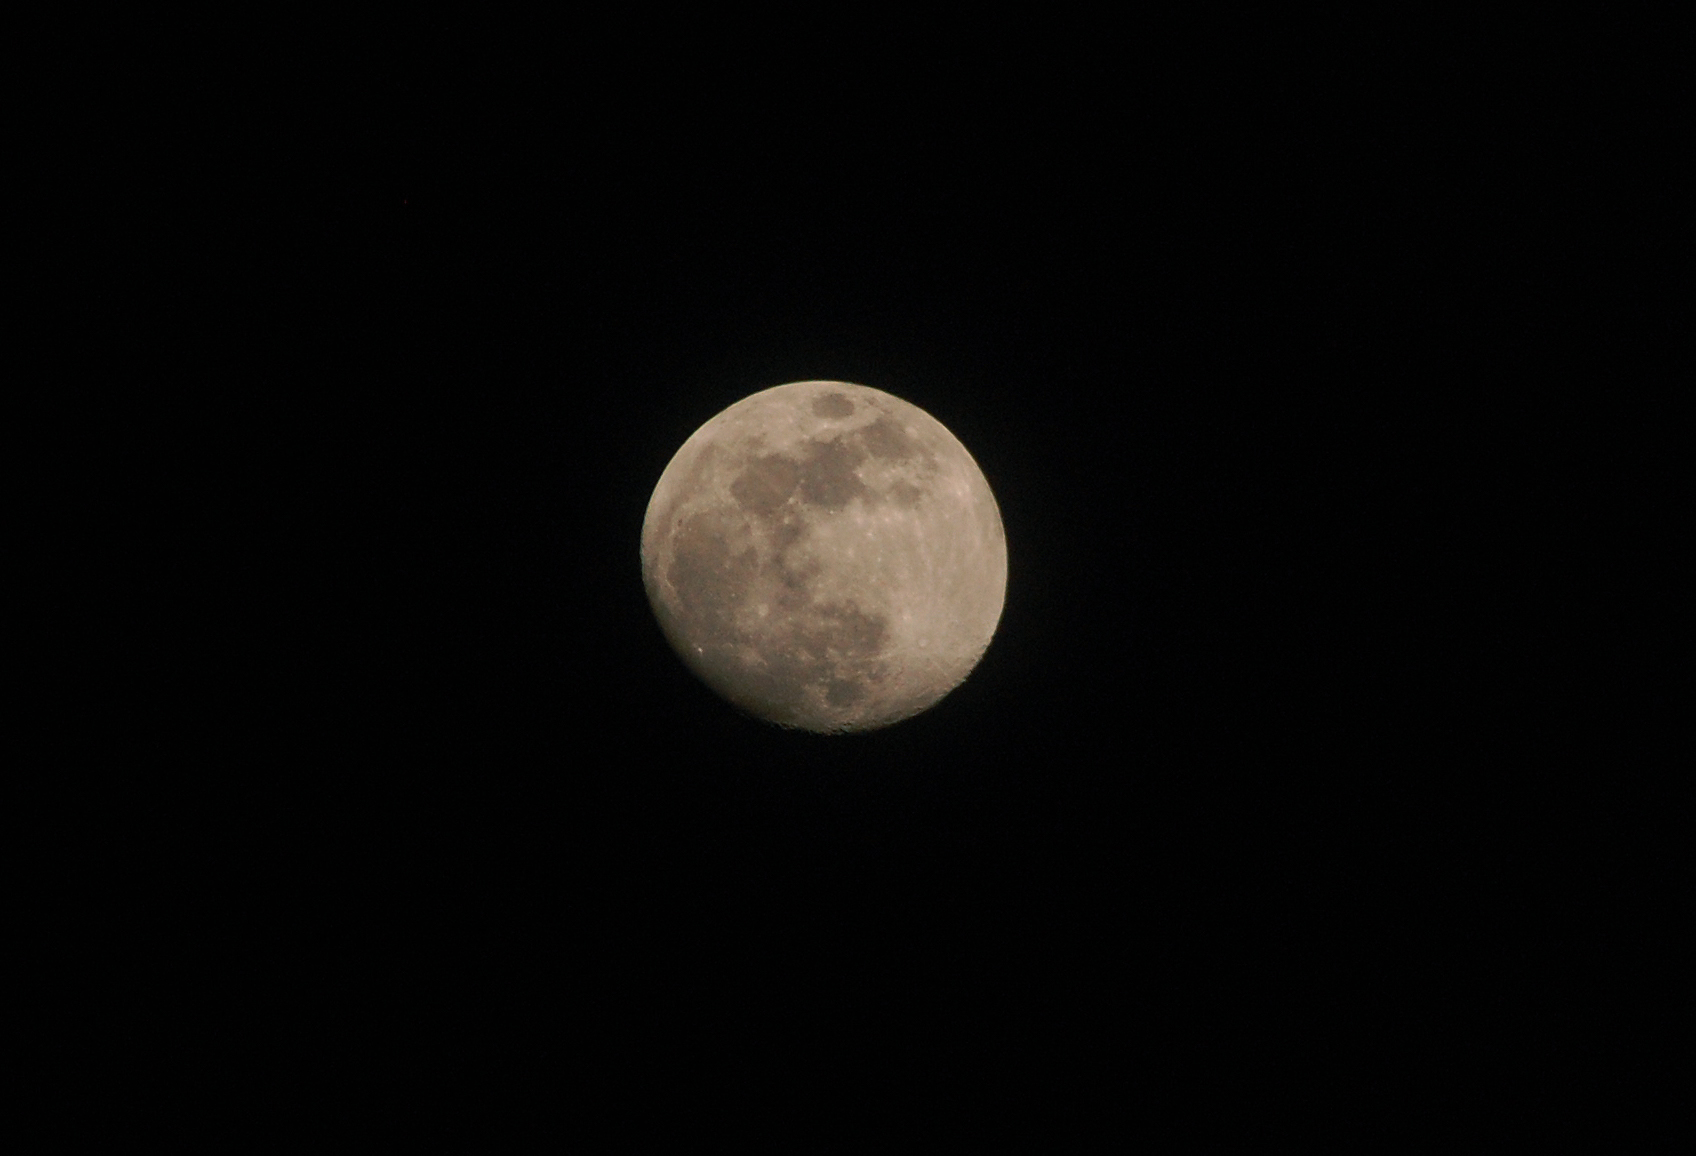 The moon photo